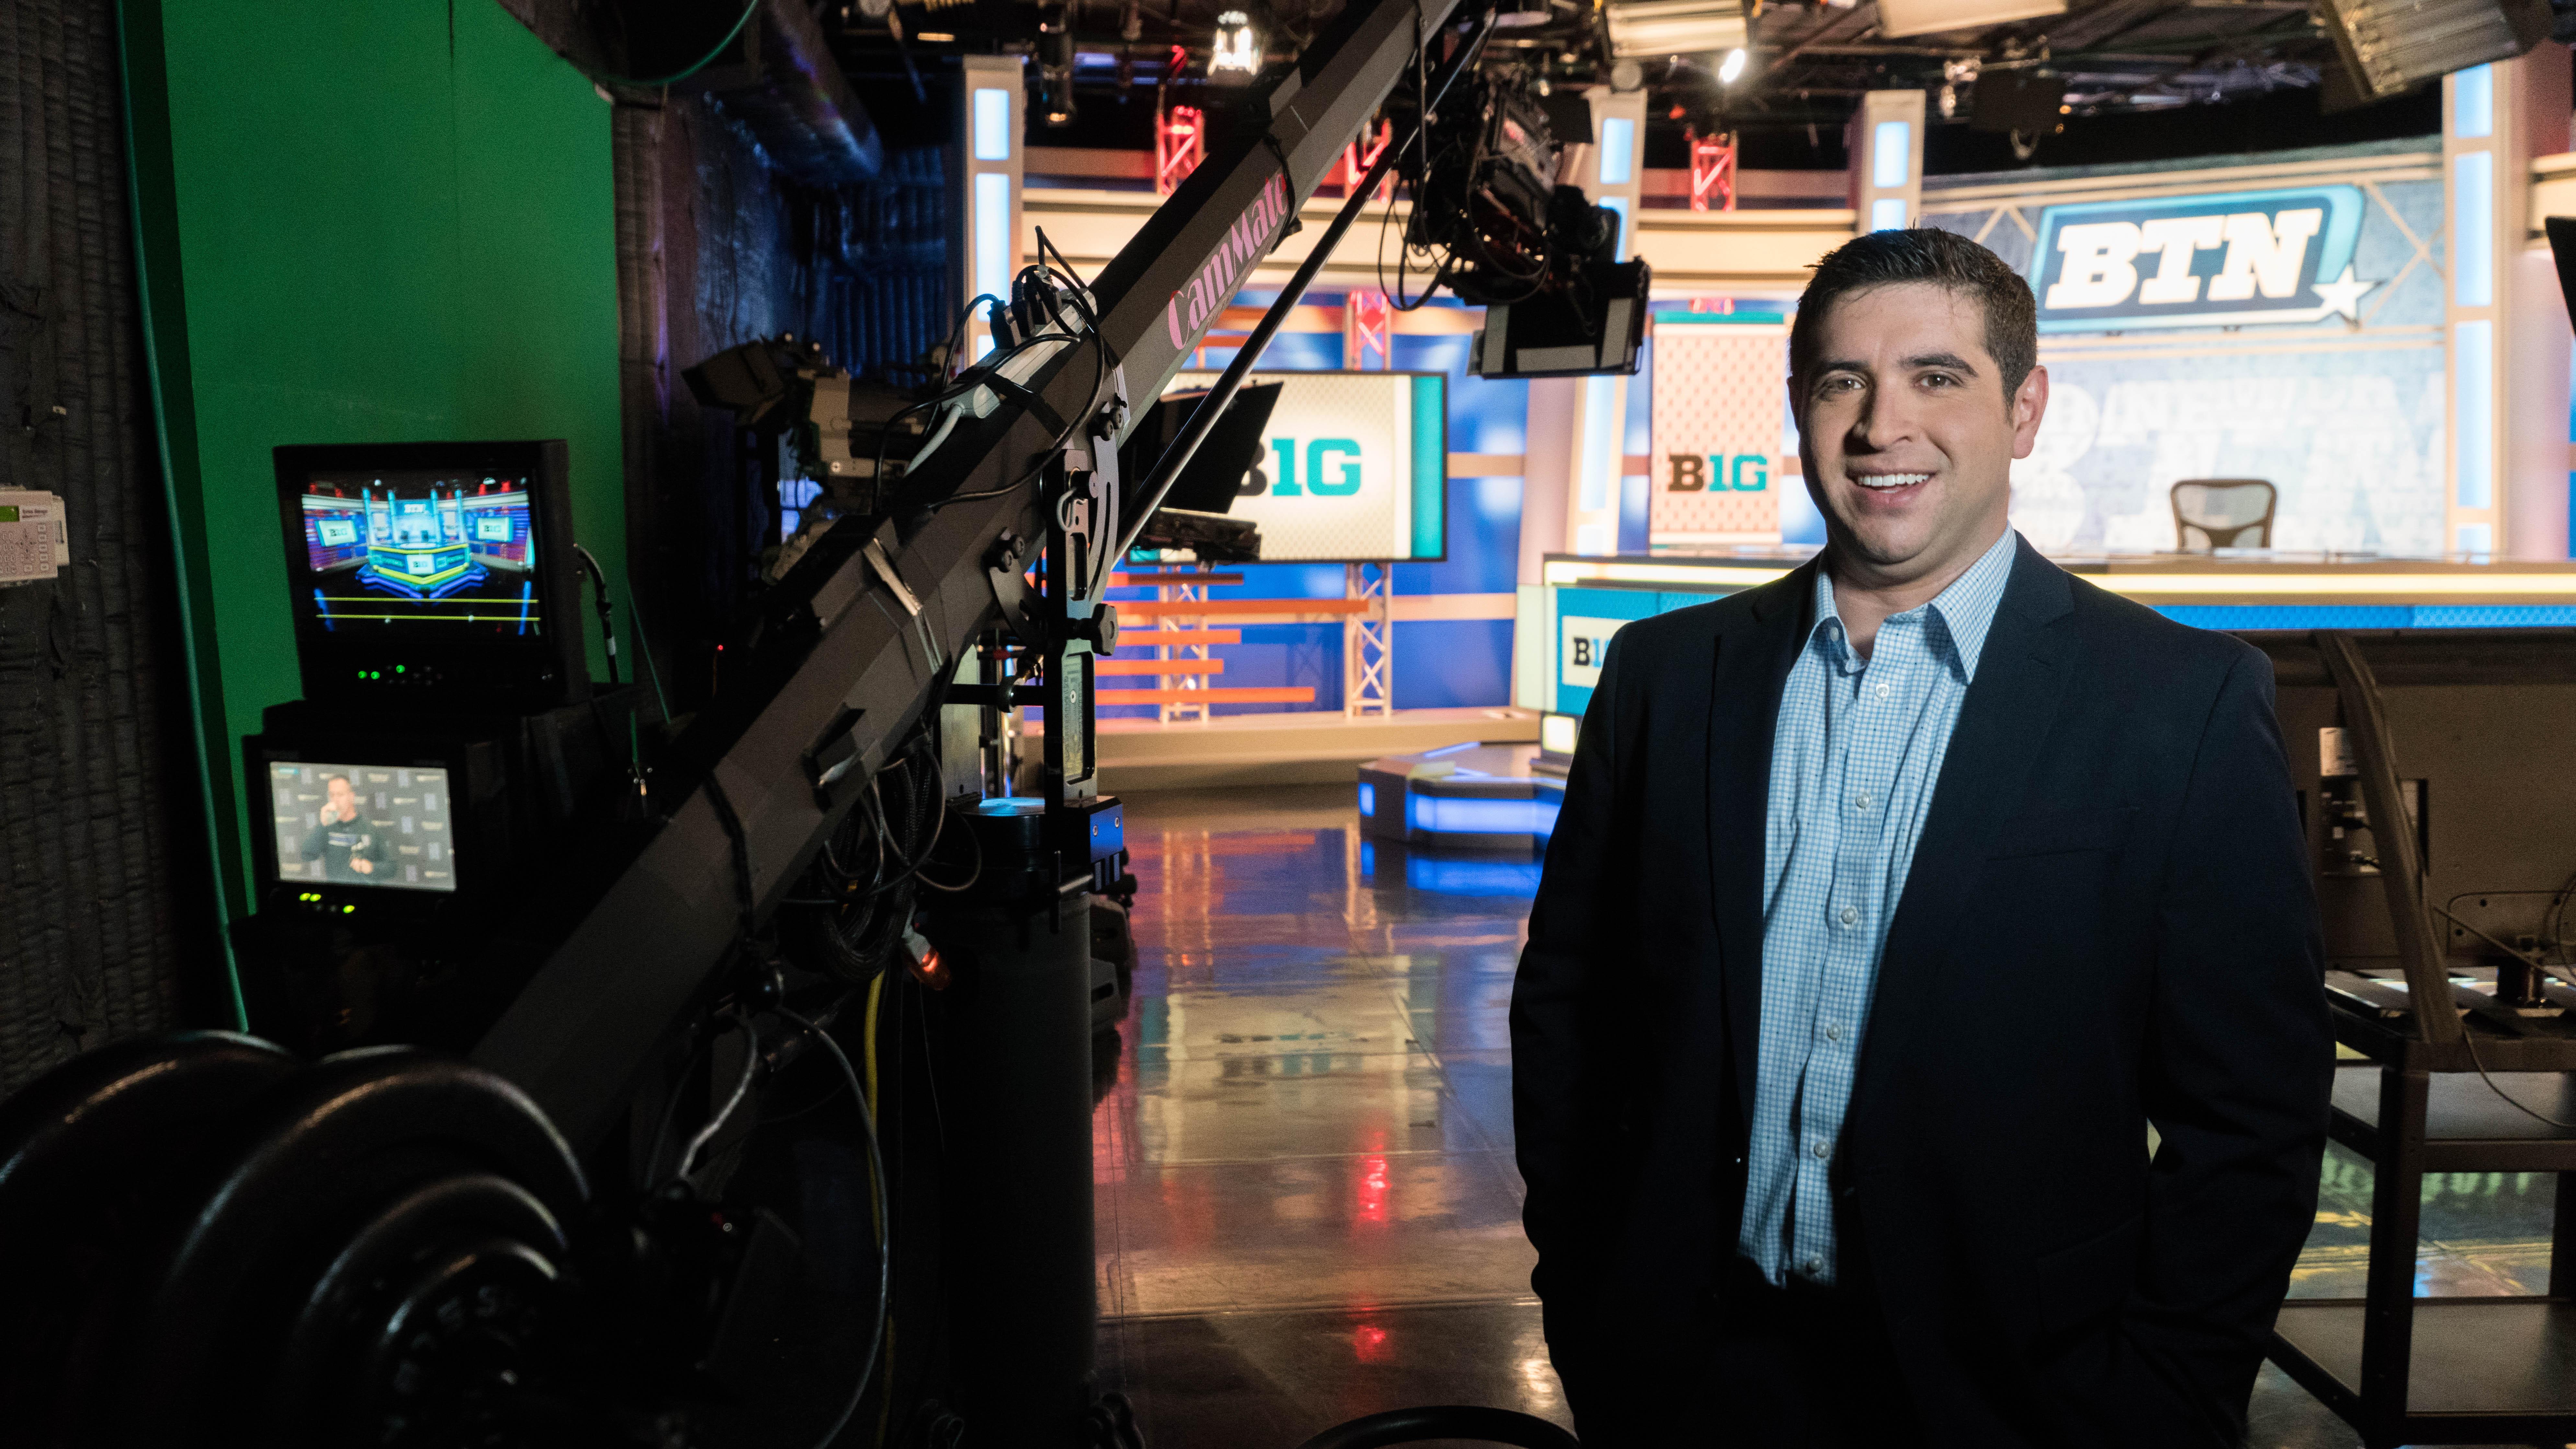 University of Iowa graduate Jordan Loperena in the Big Ten Network studio